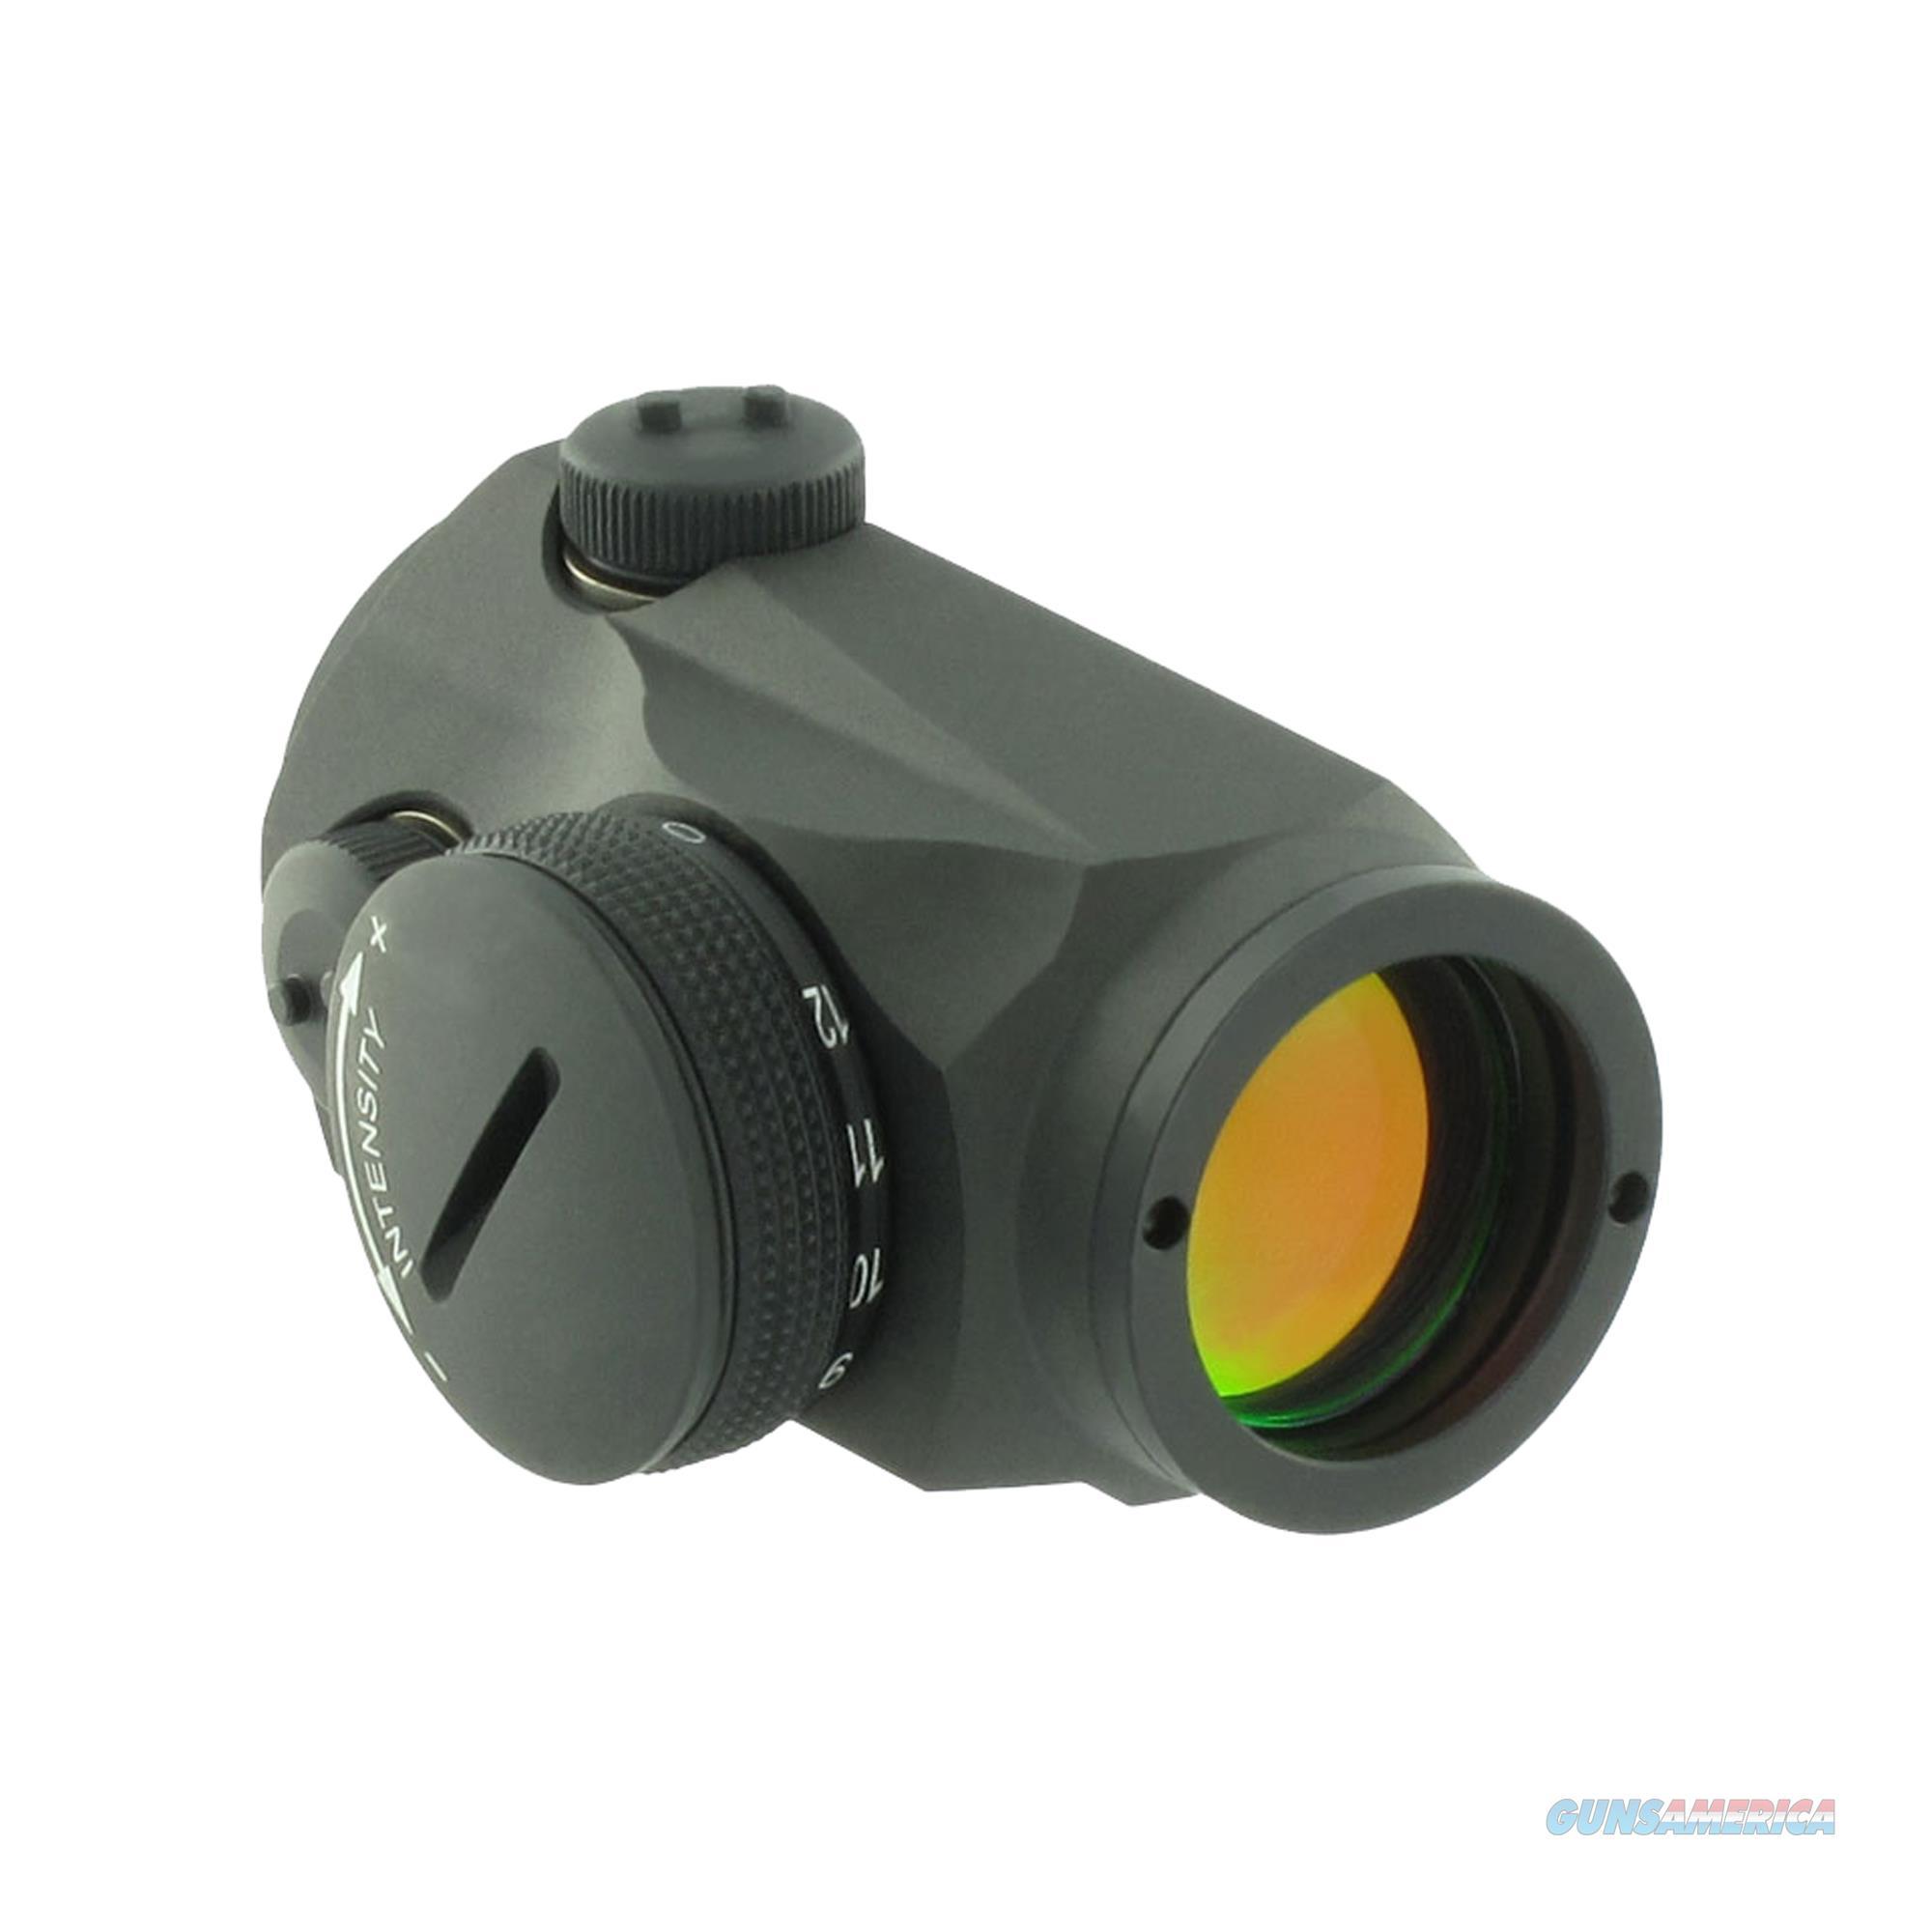 Aimpoint Micro 200055  Non-Guns > Iron/Metal/Peep Sights